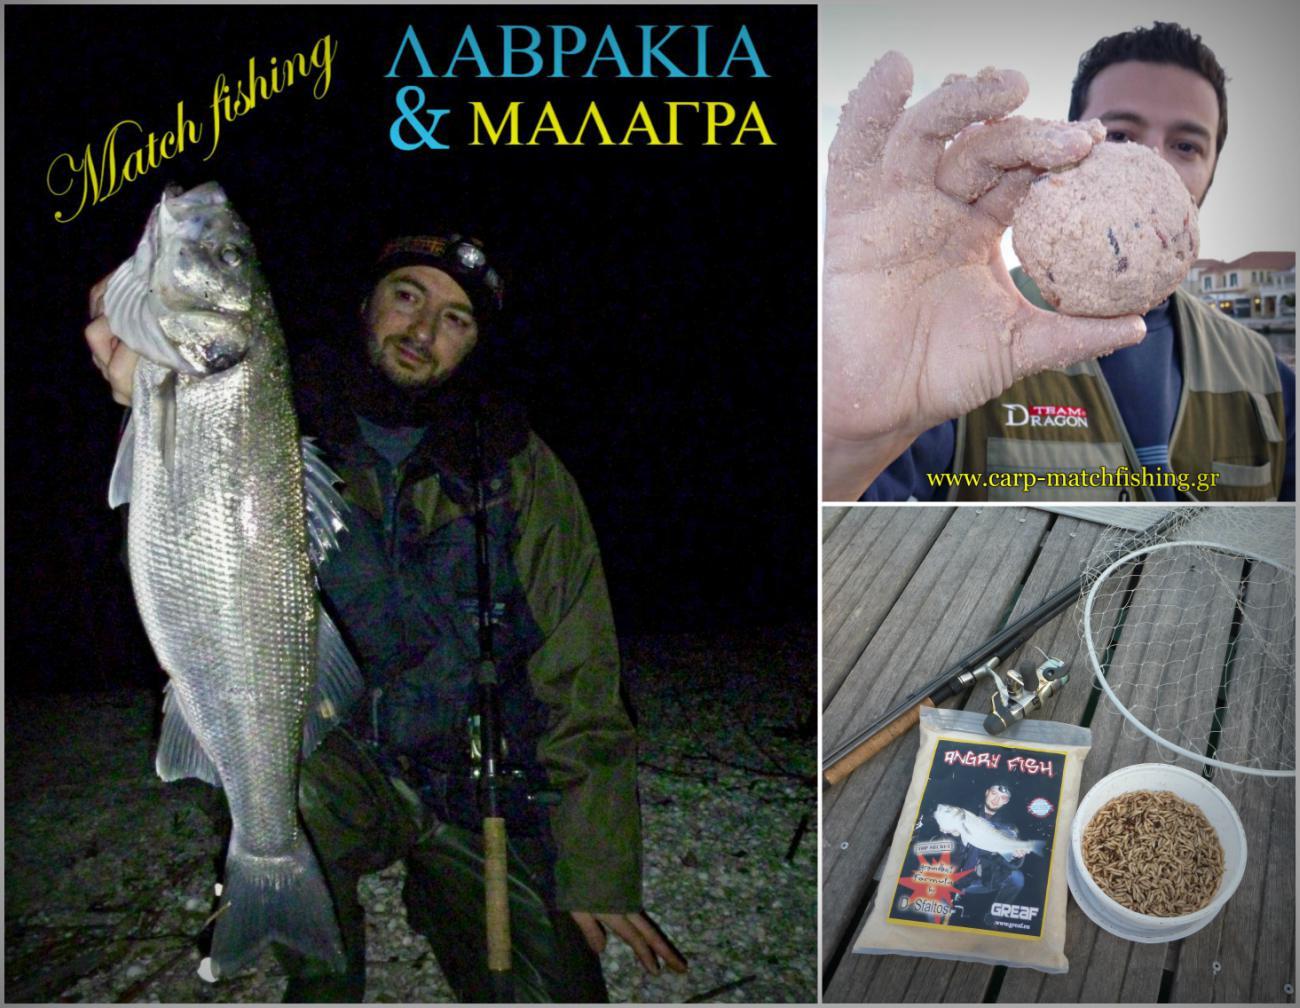 layrakia-kai-malagra-matchfishing-eggleziko-angry-fish-sfaltos-malagra-carpmatchfishing